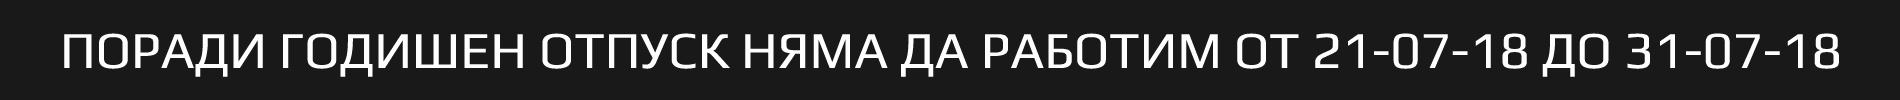 magazin-masla-sofia